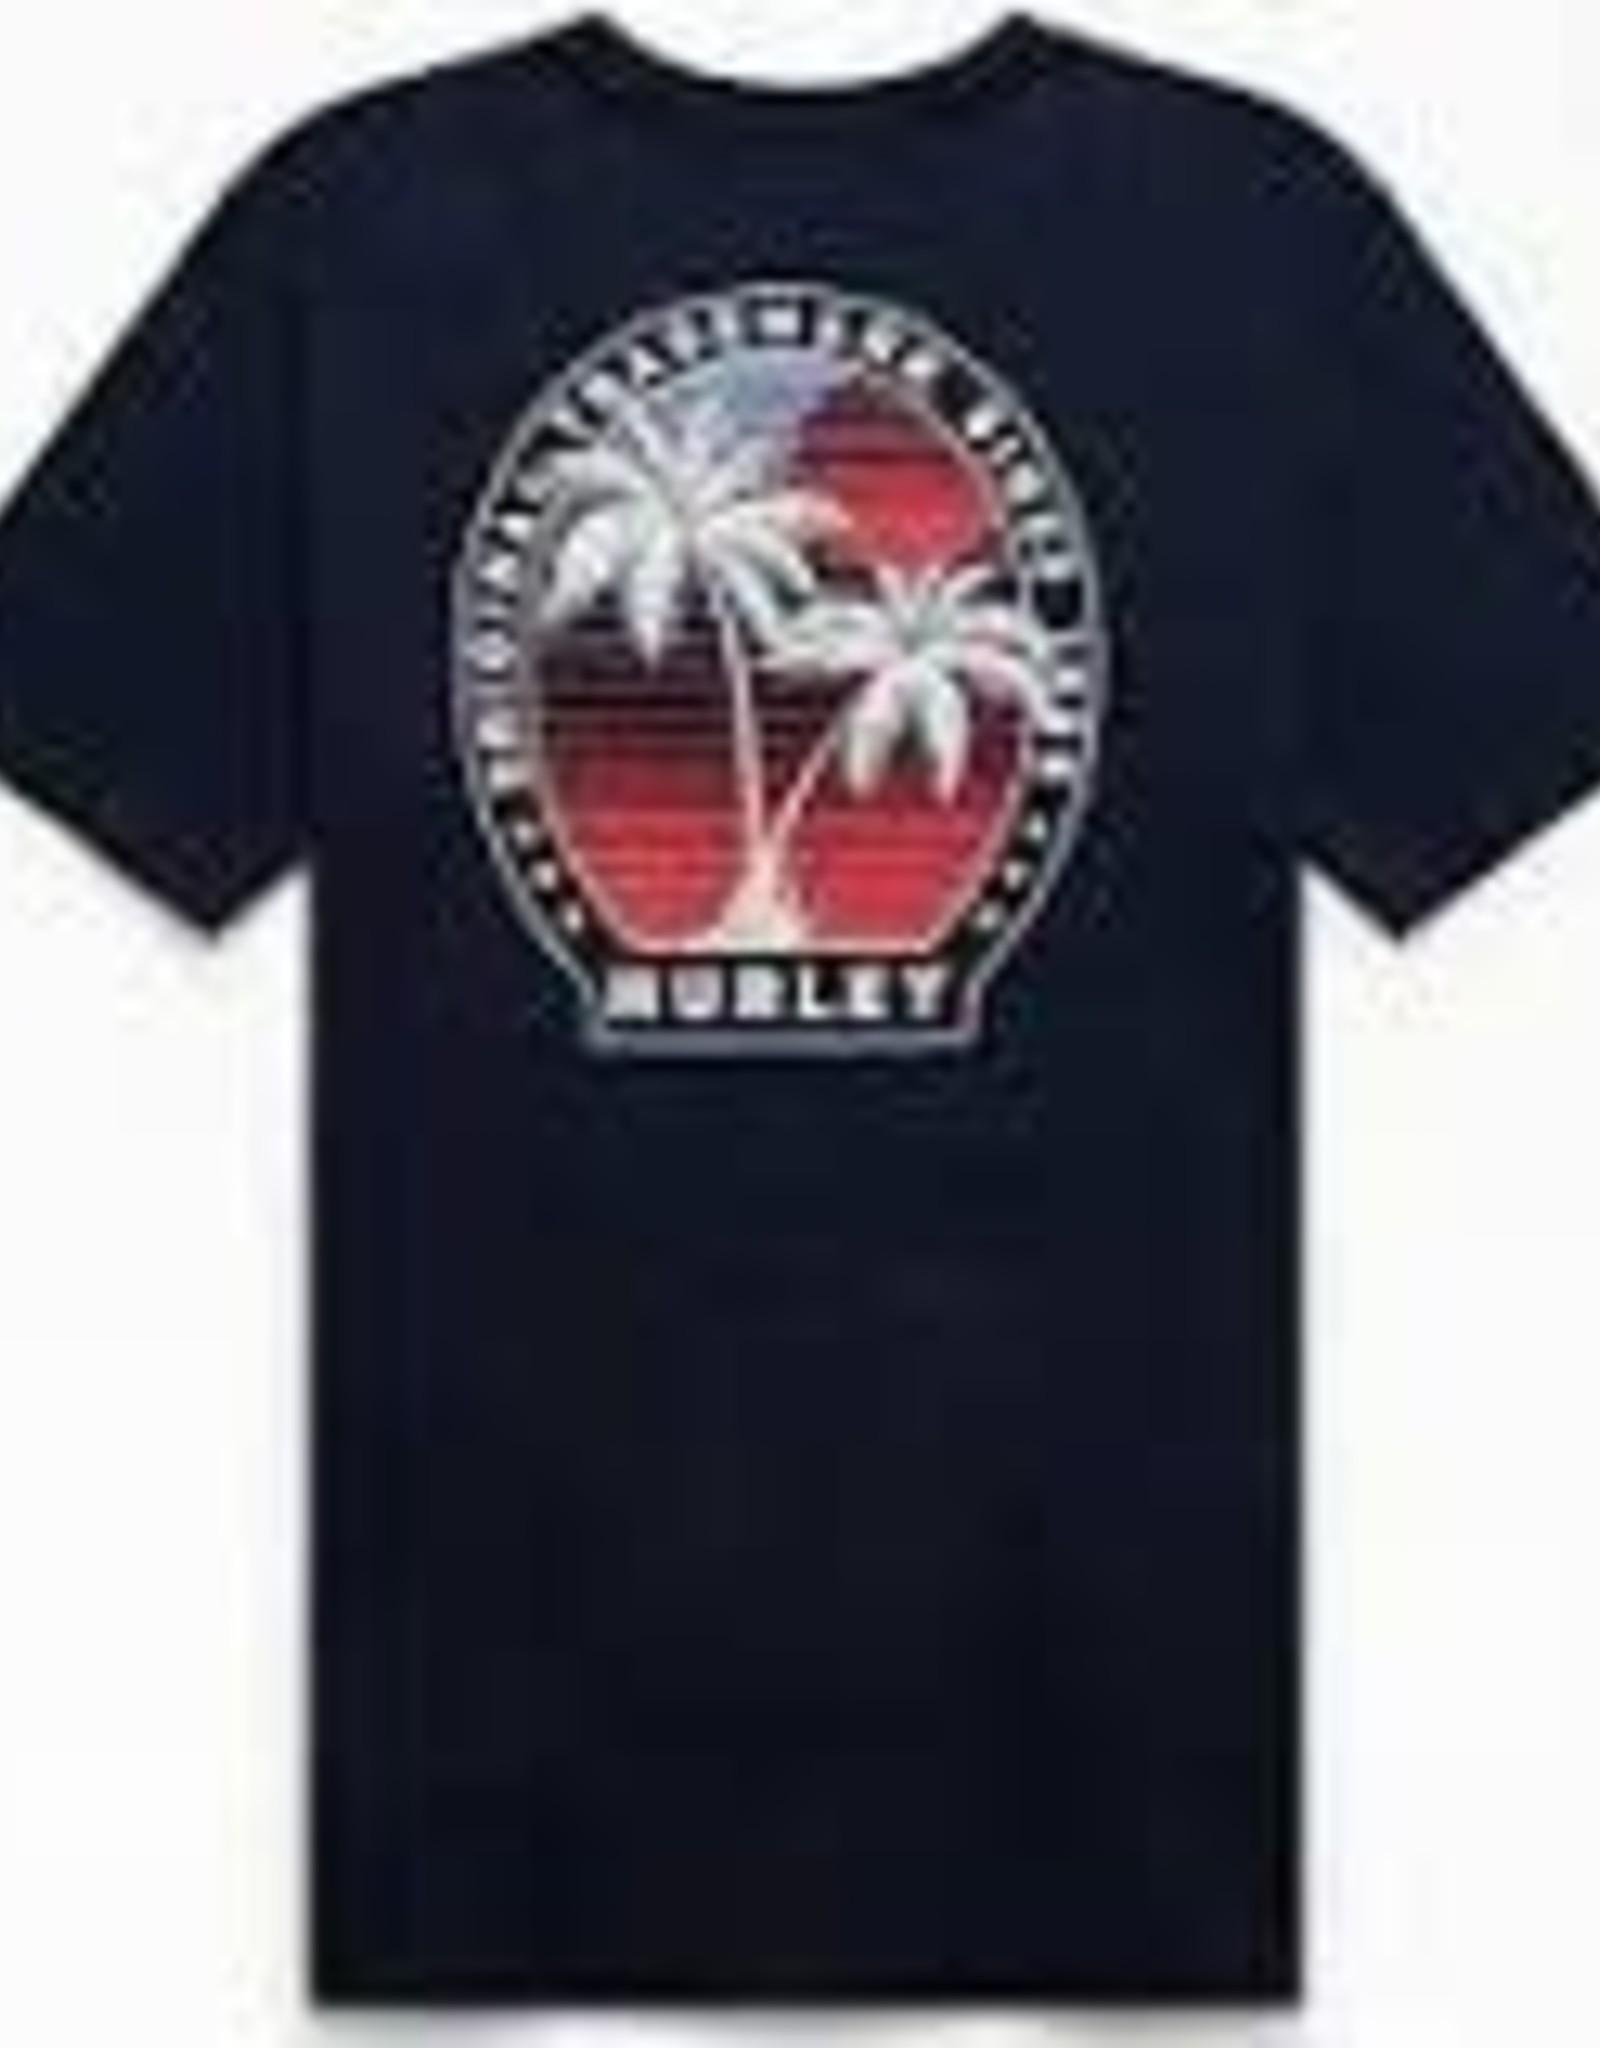 Hurley Hurley Wish Worker S/S Tee DB8847